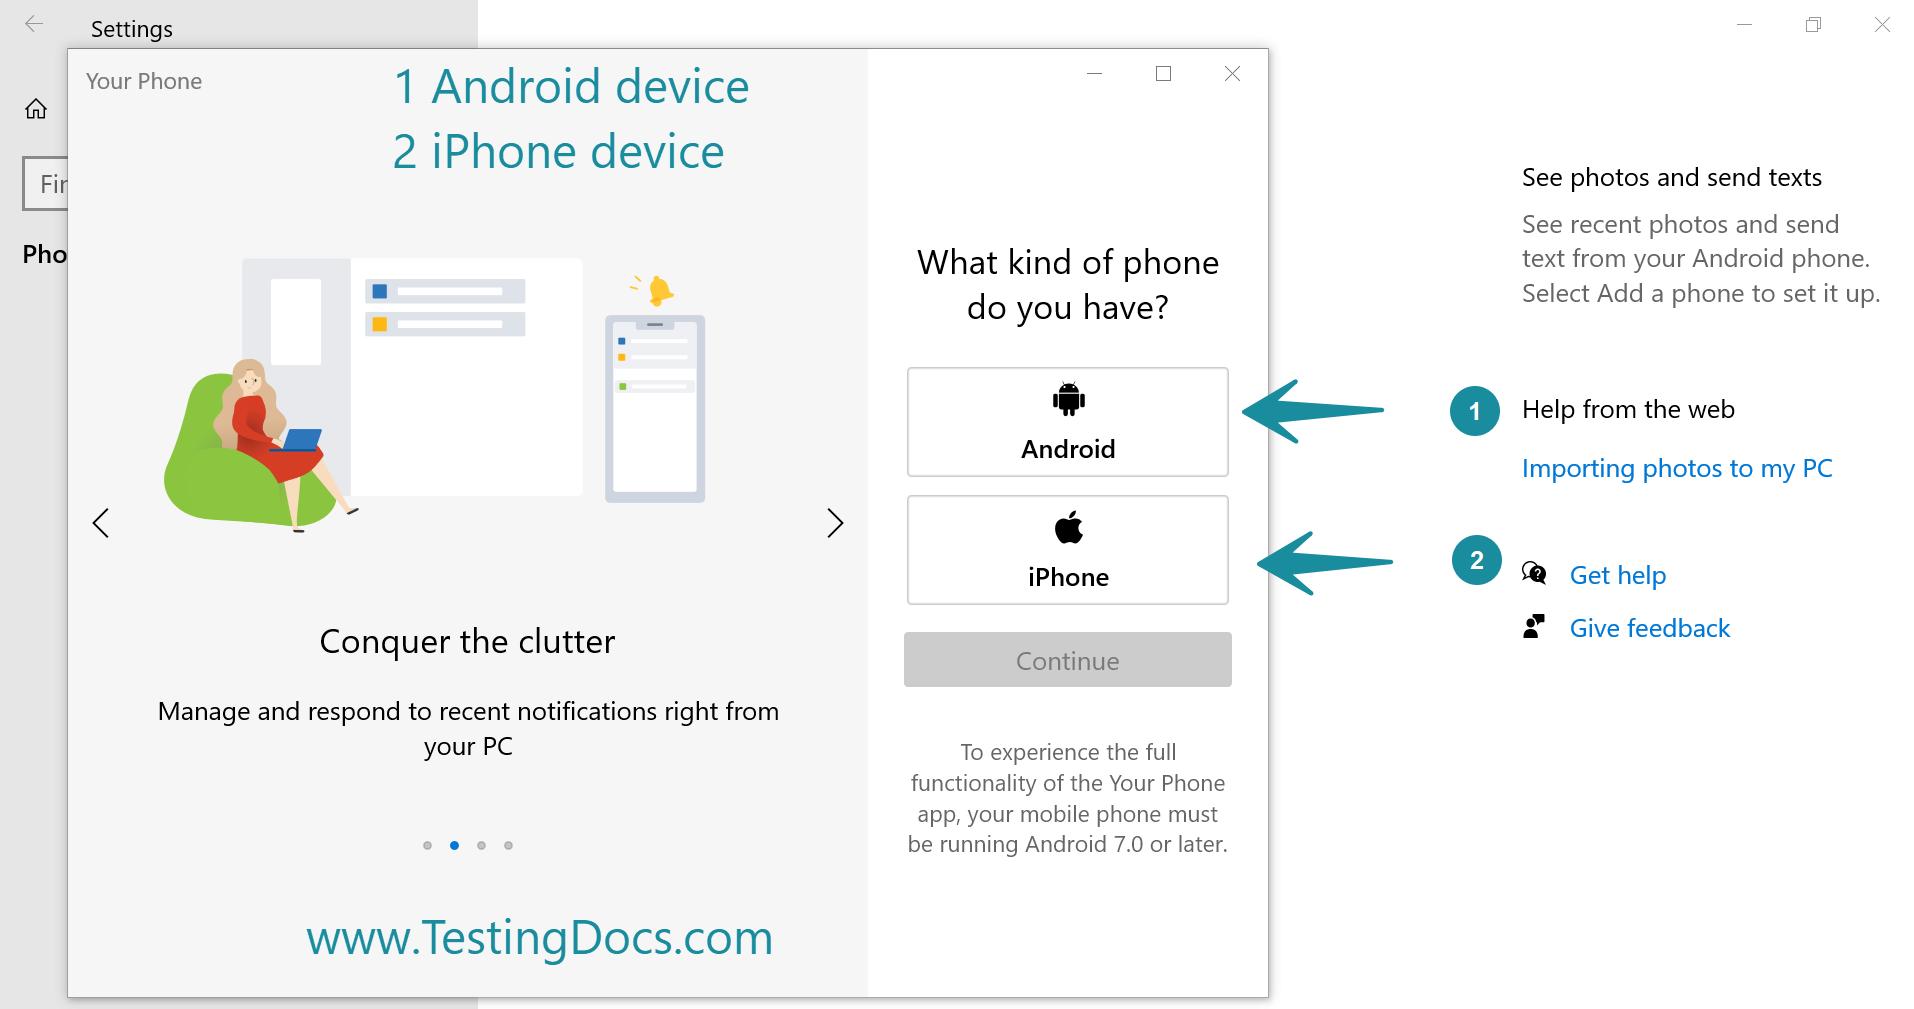 Phone Choice Screen